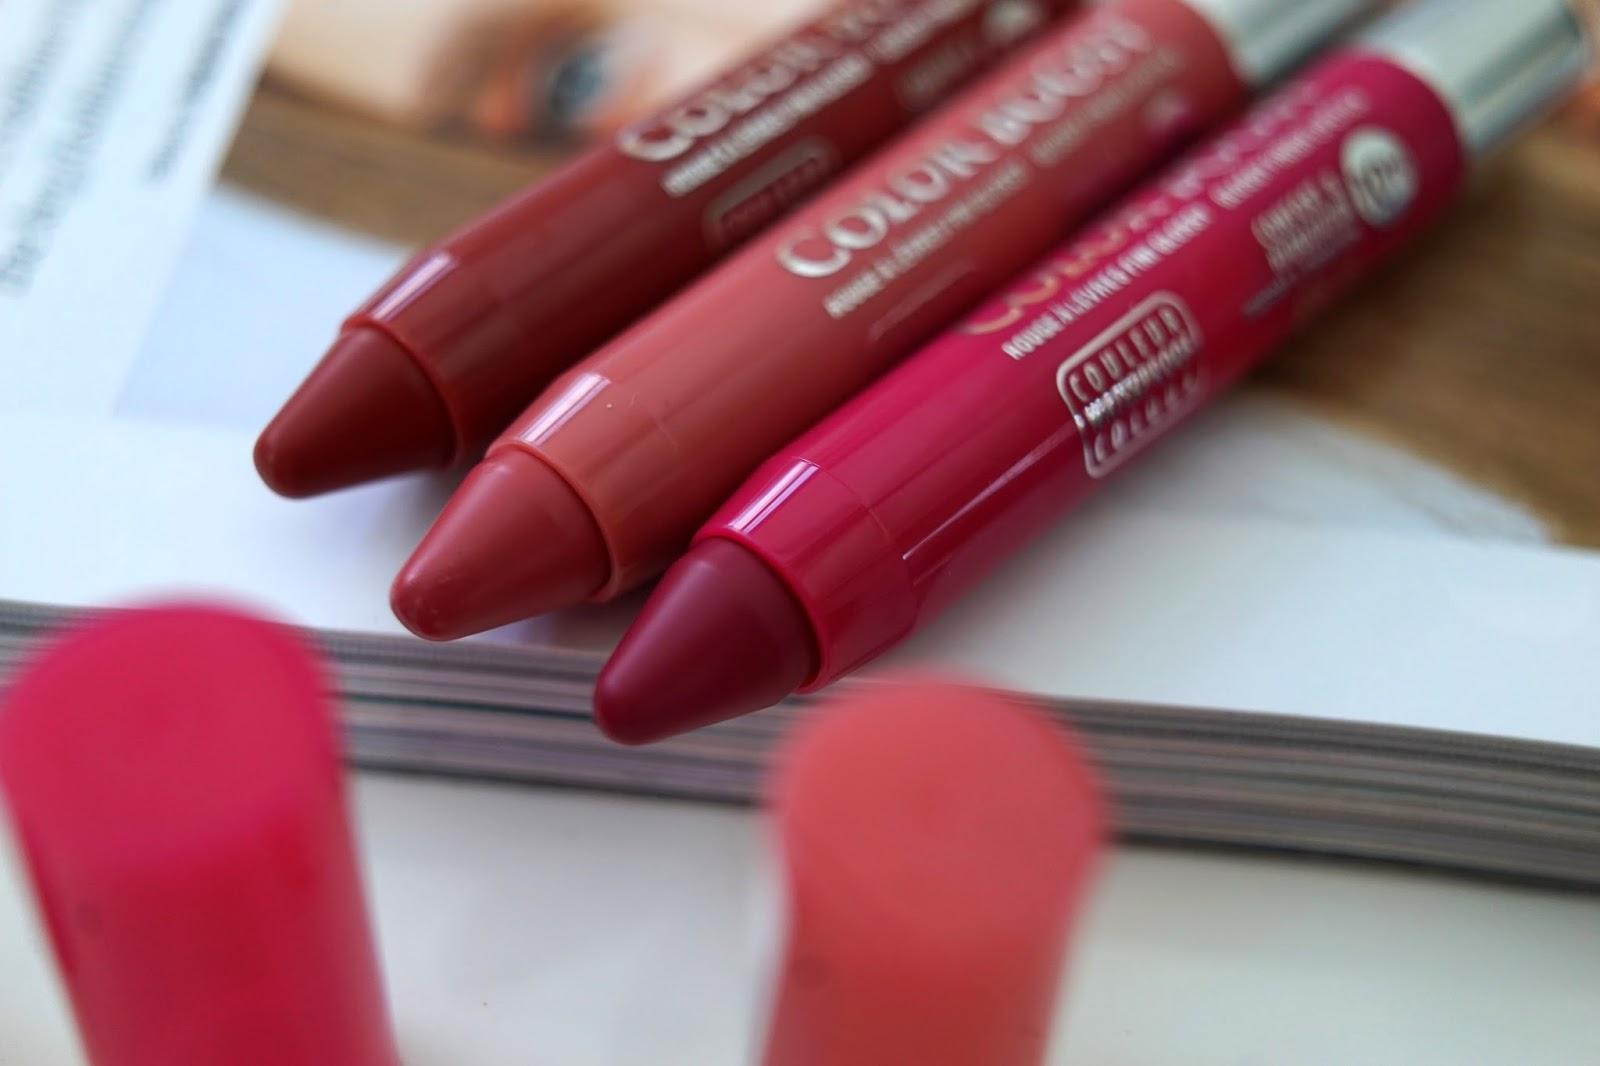 bourjois color boost lipsticks